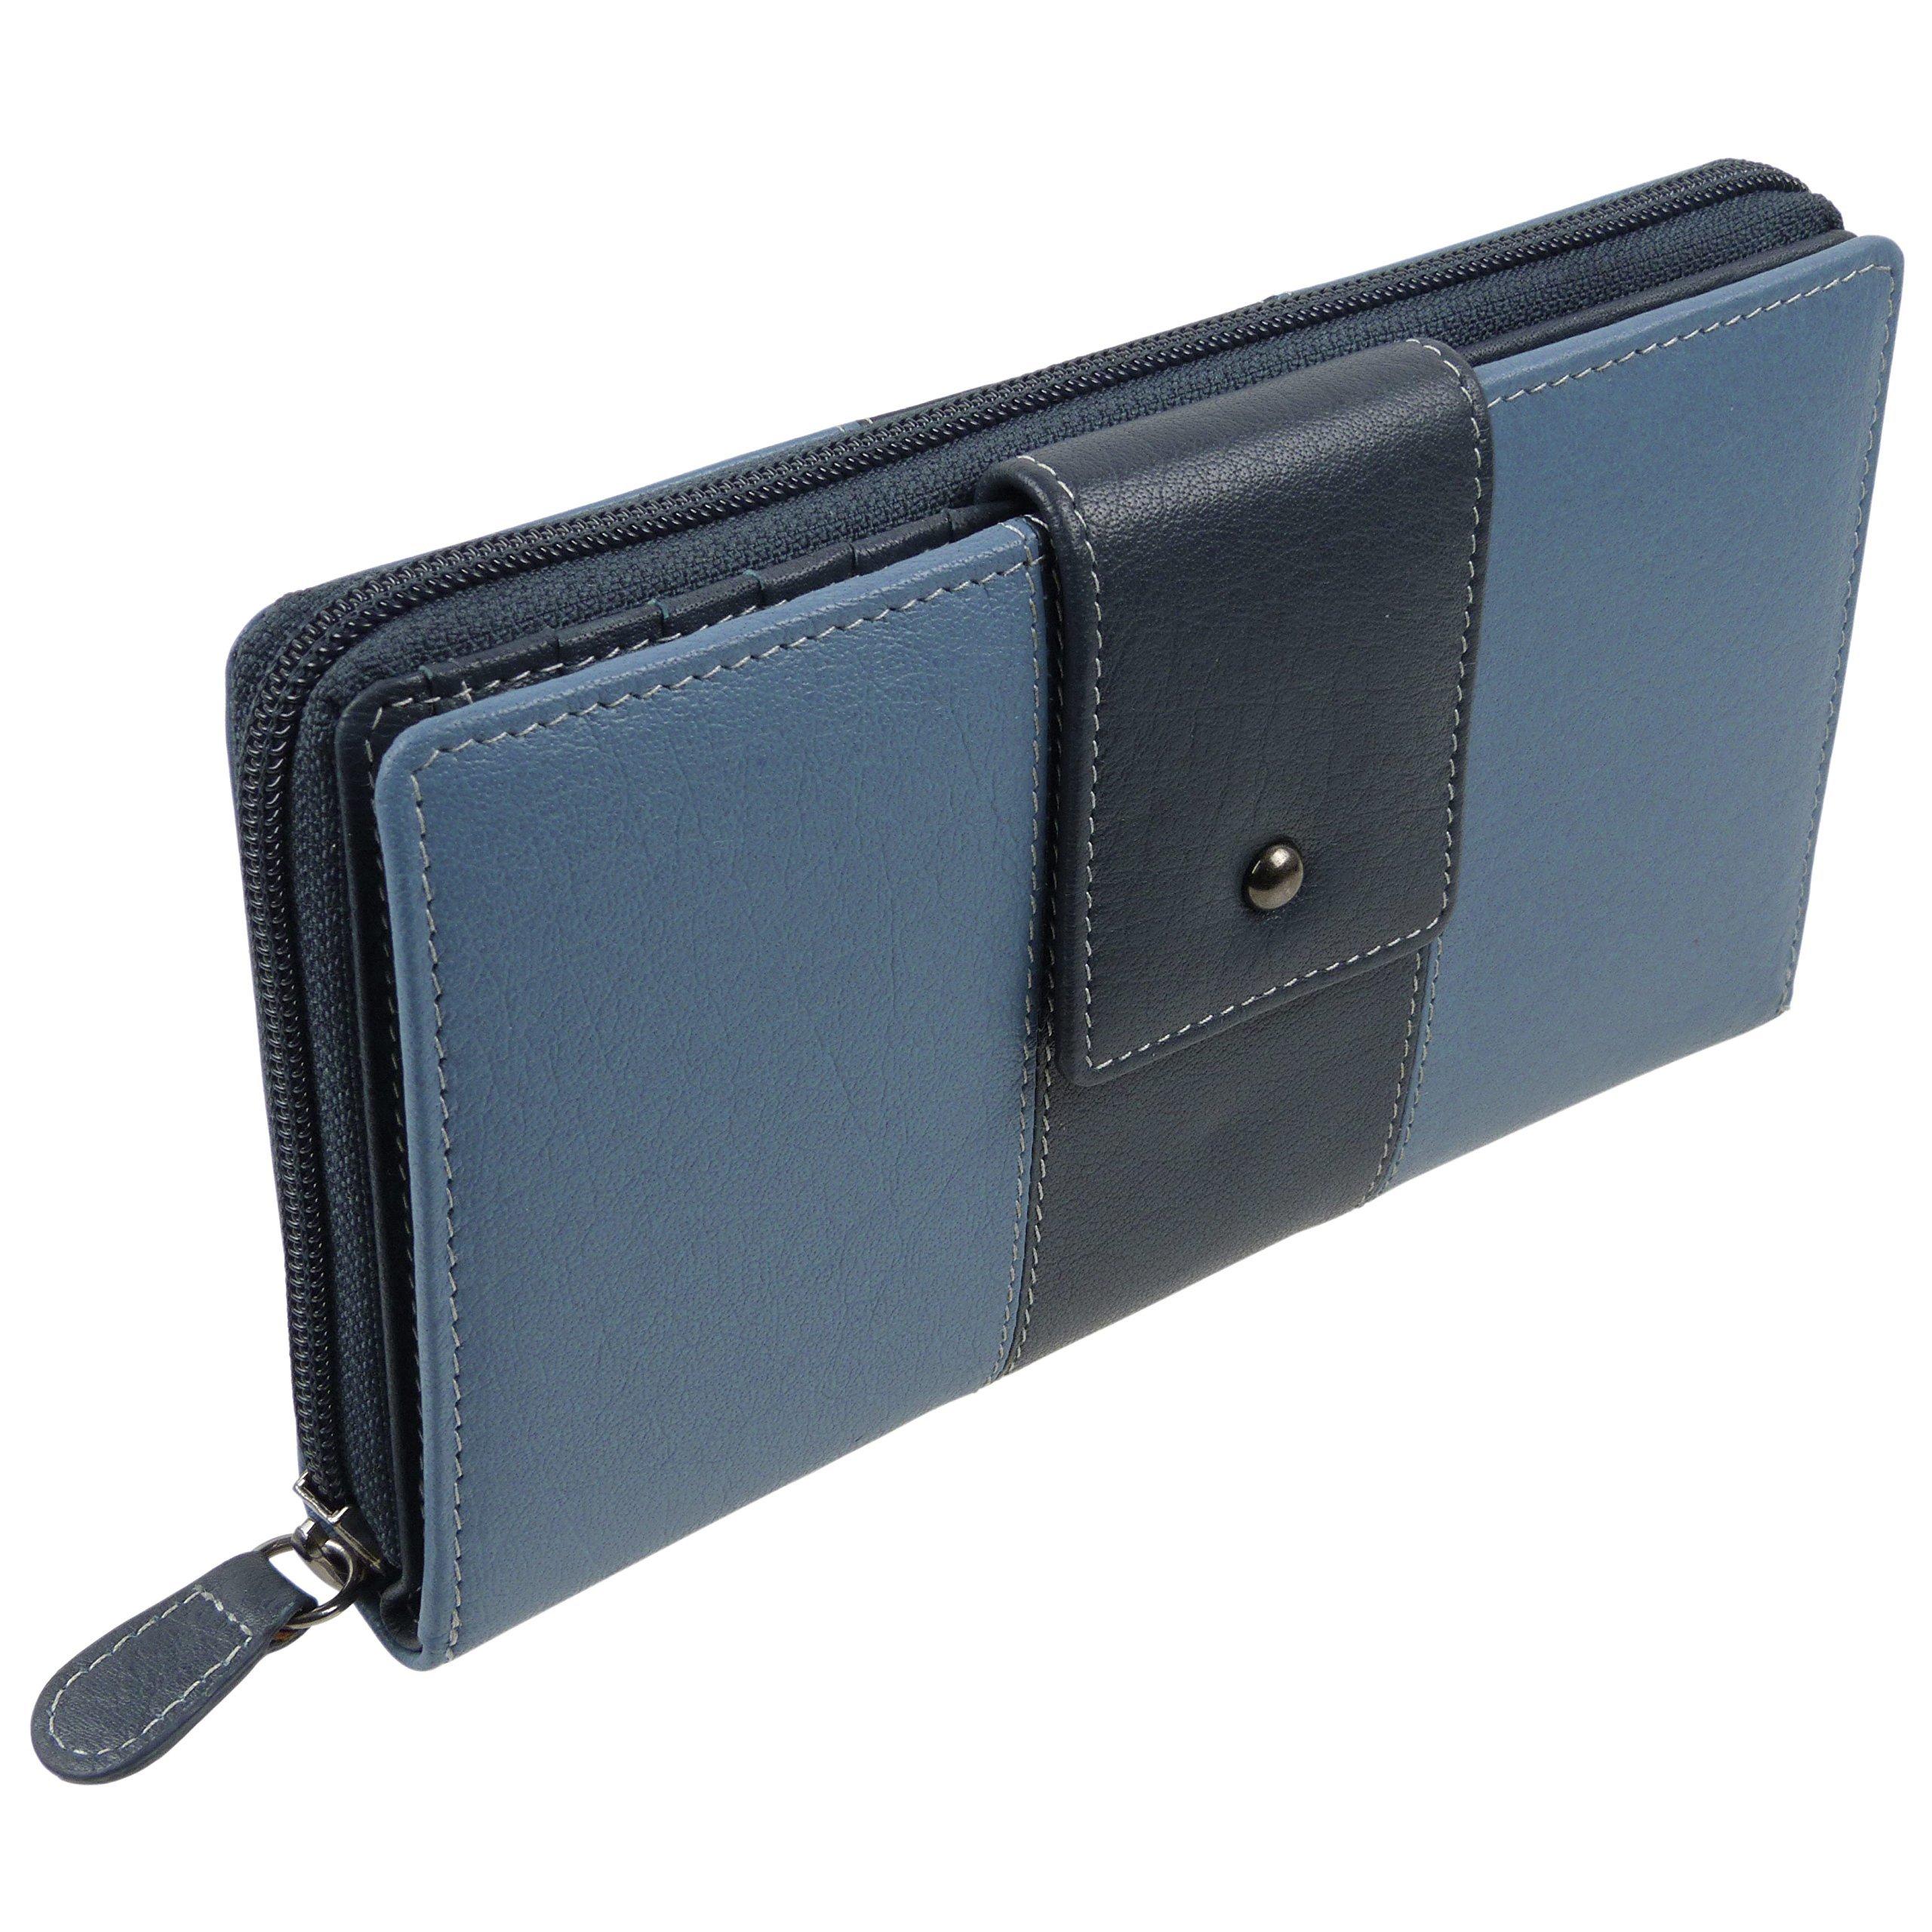 Golunski Women's Tab Purse Wallet Top Leather By Onesize Blue & Navy